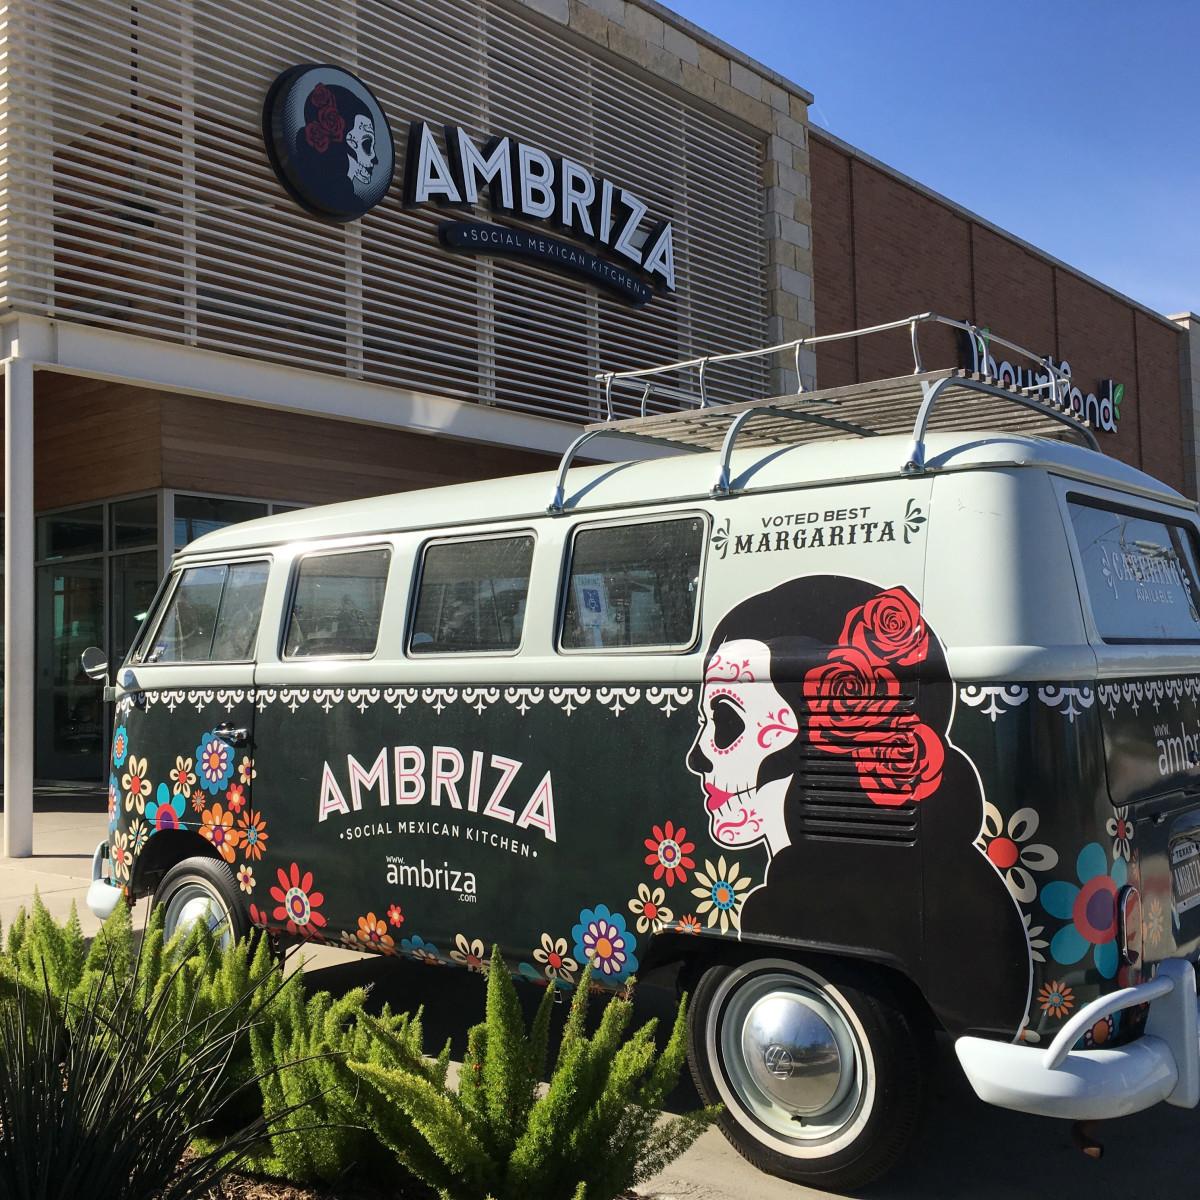 Ambriza Social Mexican Kitchen exterior